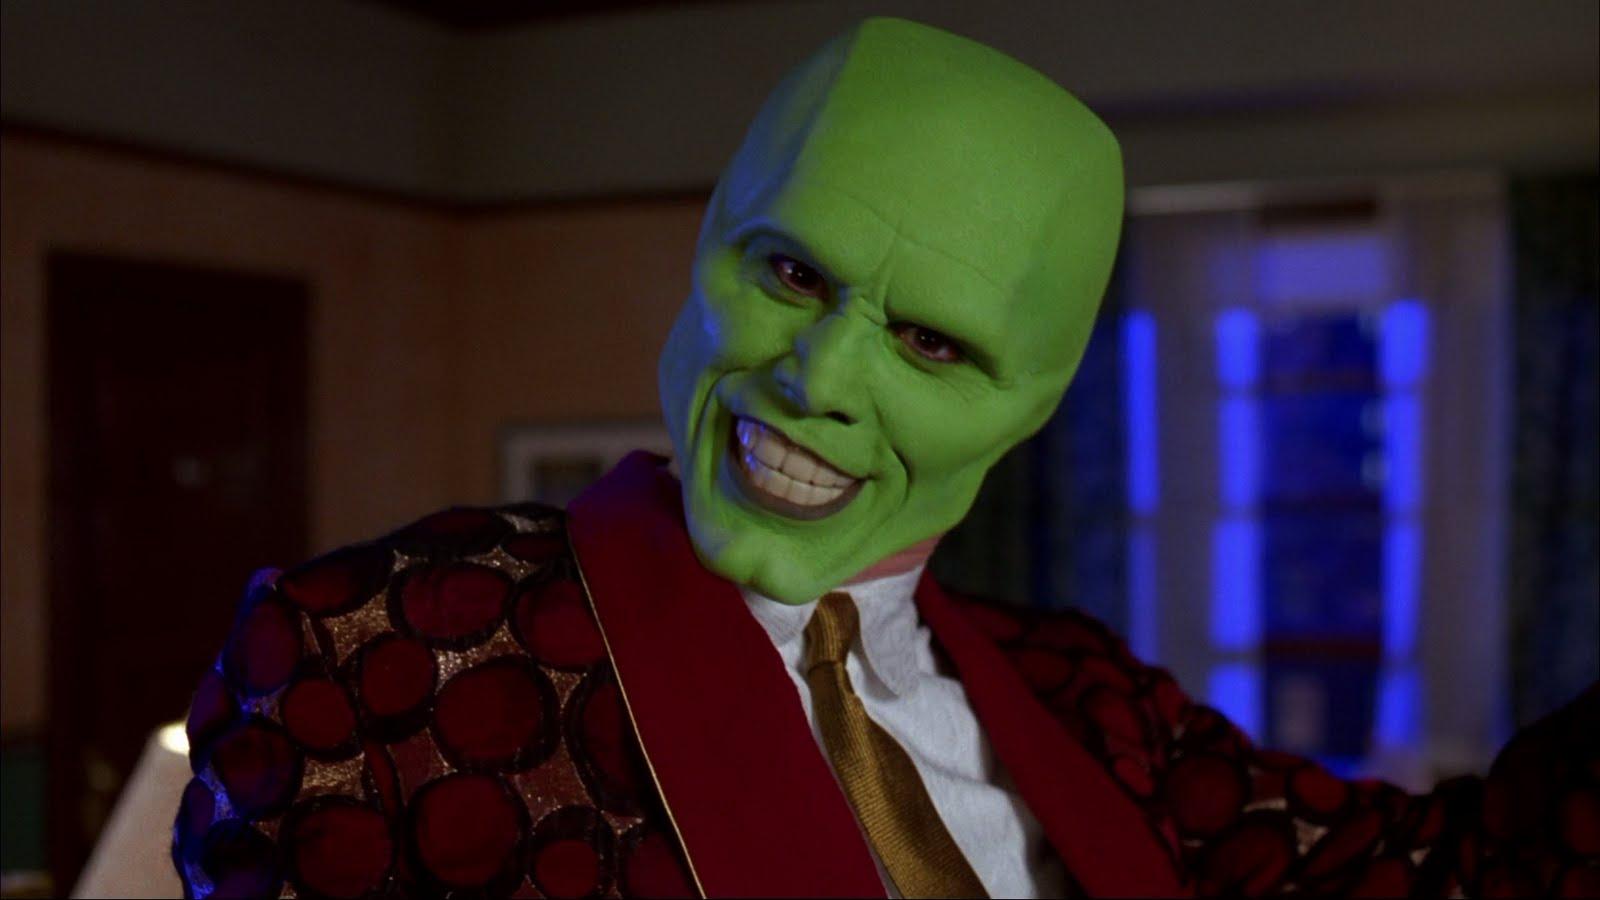 http://1.bp.blogspot.com/-f6aI6RowlPw/TpgVVRhF1aI/AAAAAAAAAgE/LtkOcwhVTcs/s1600/large-mask-blu-ray-4brd.jpg